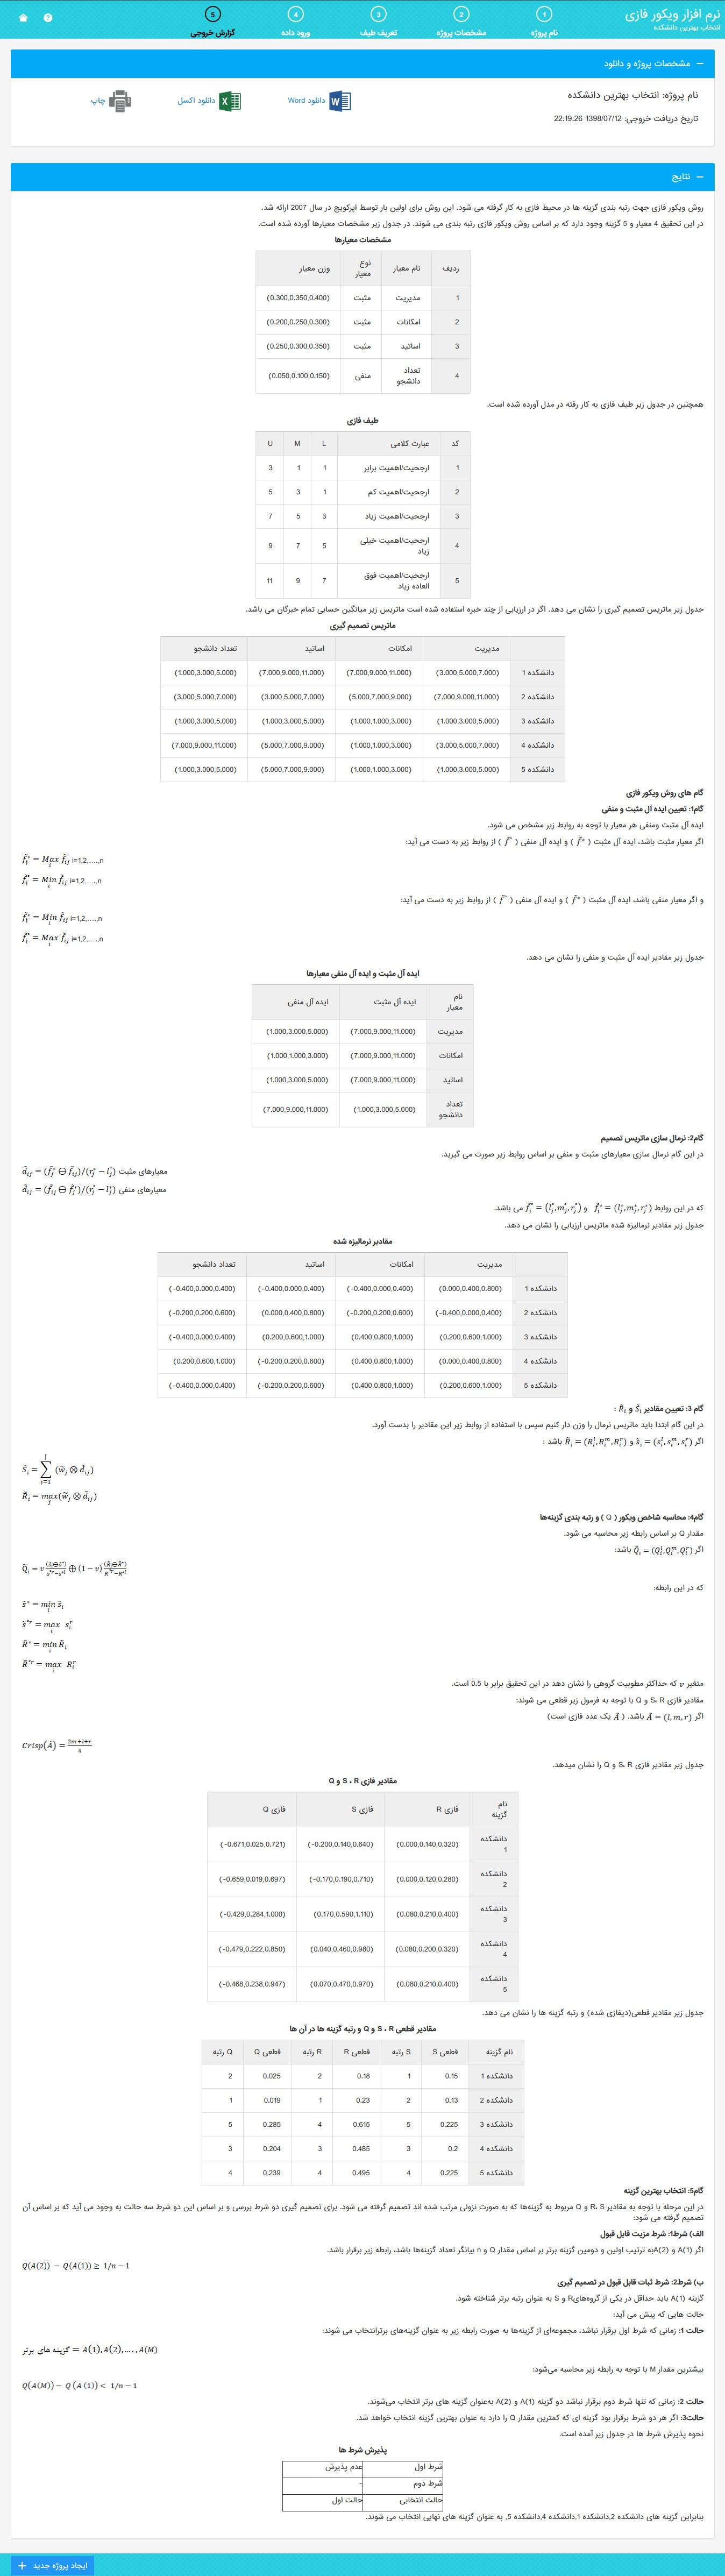 نرم افزار ویکور فازی- تصویر گزارش خروجی